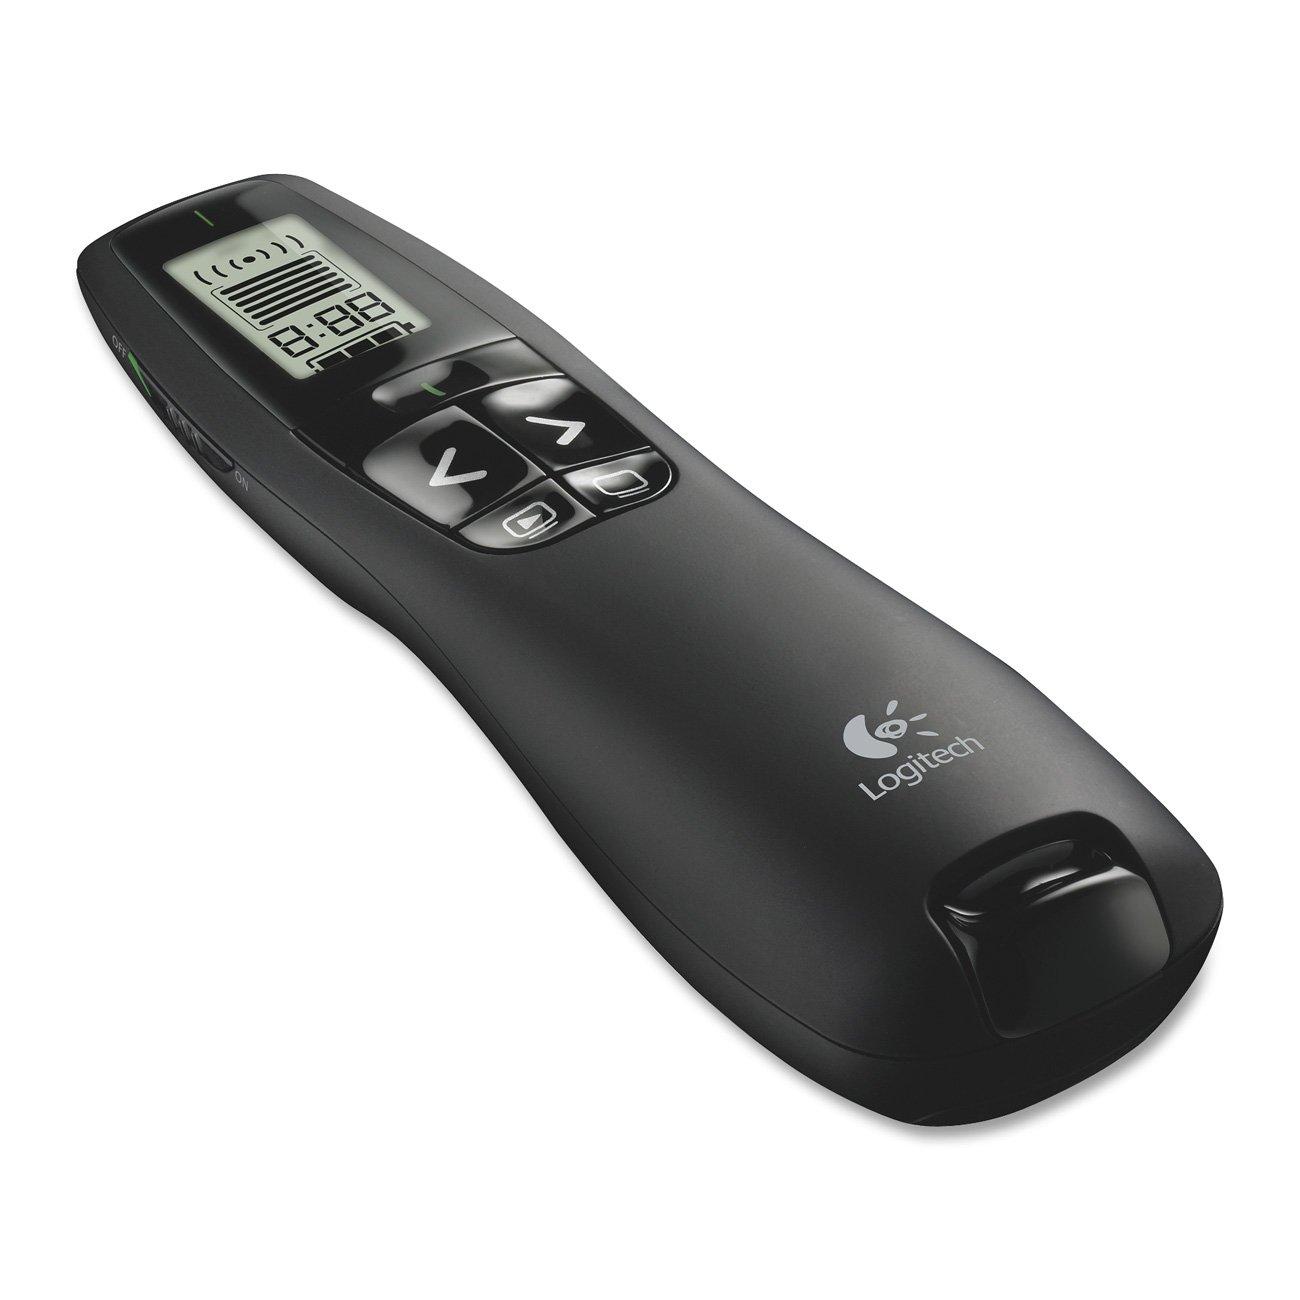 Logitech PPT remote